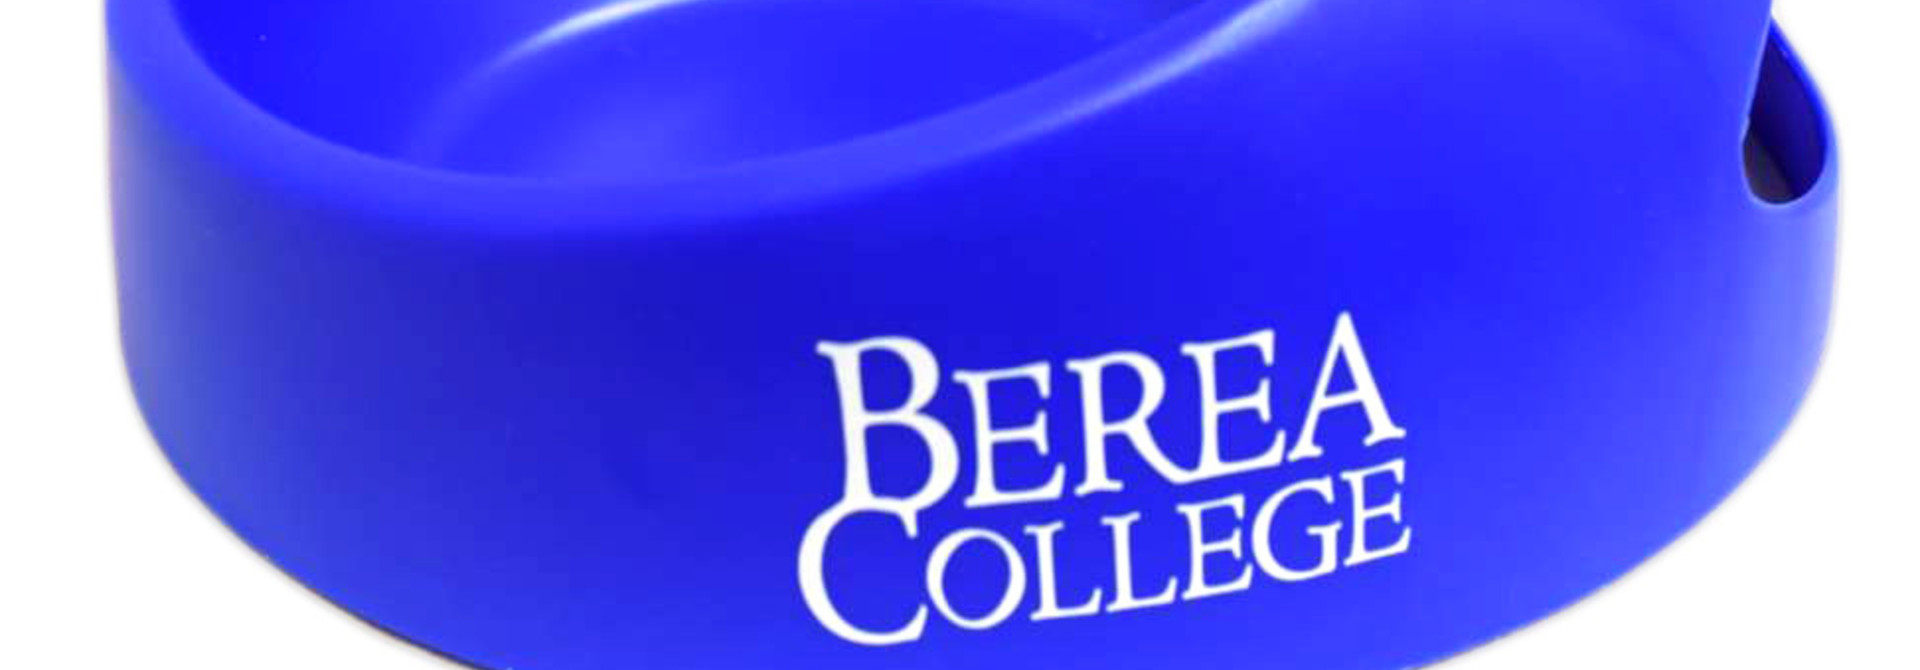 Berea Blue Dog Bowls